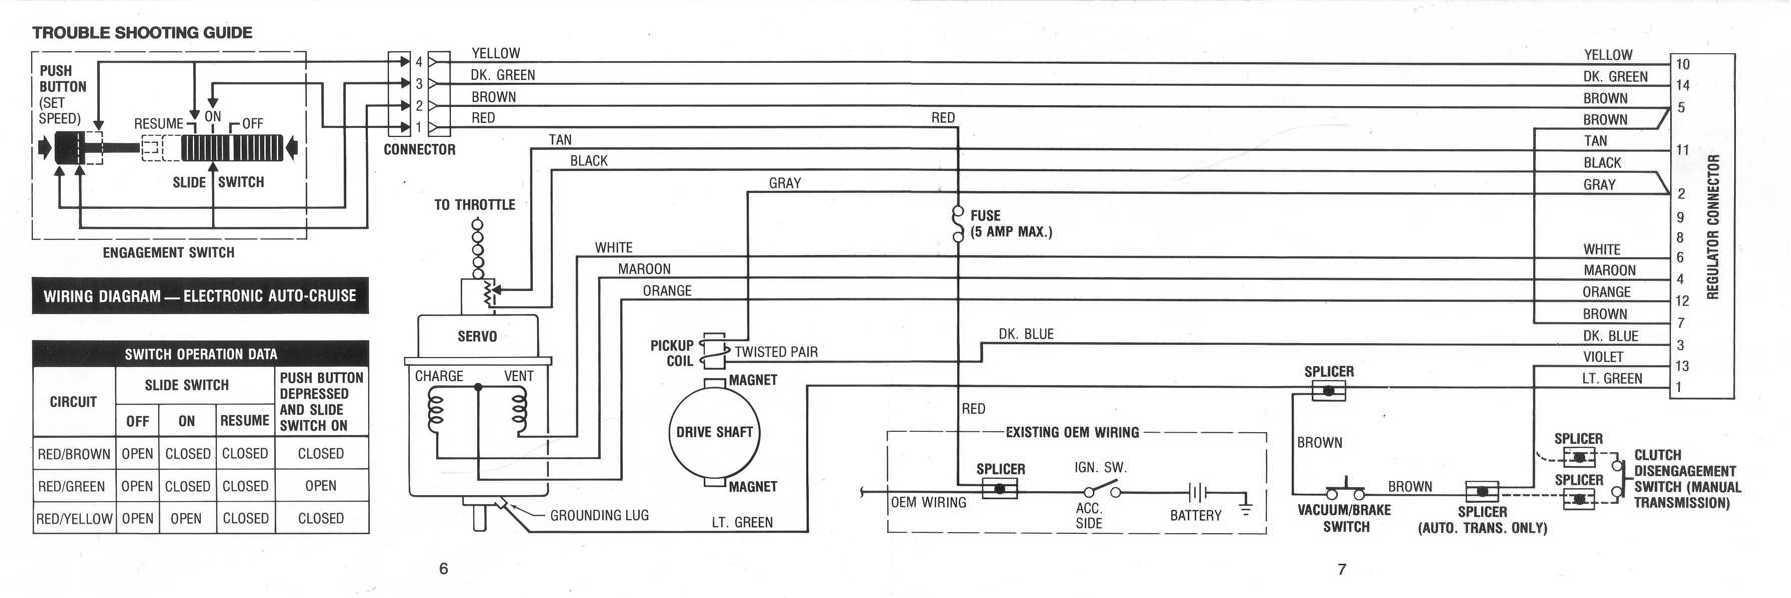 Zig Unit Wiring Diagram - Schematic Diagrams